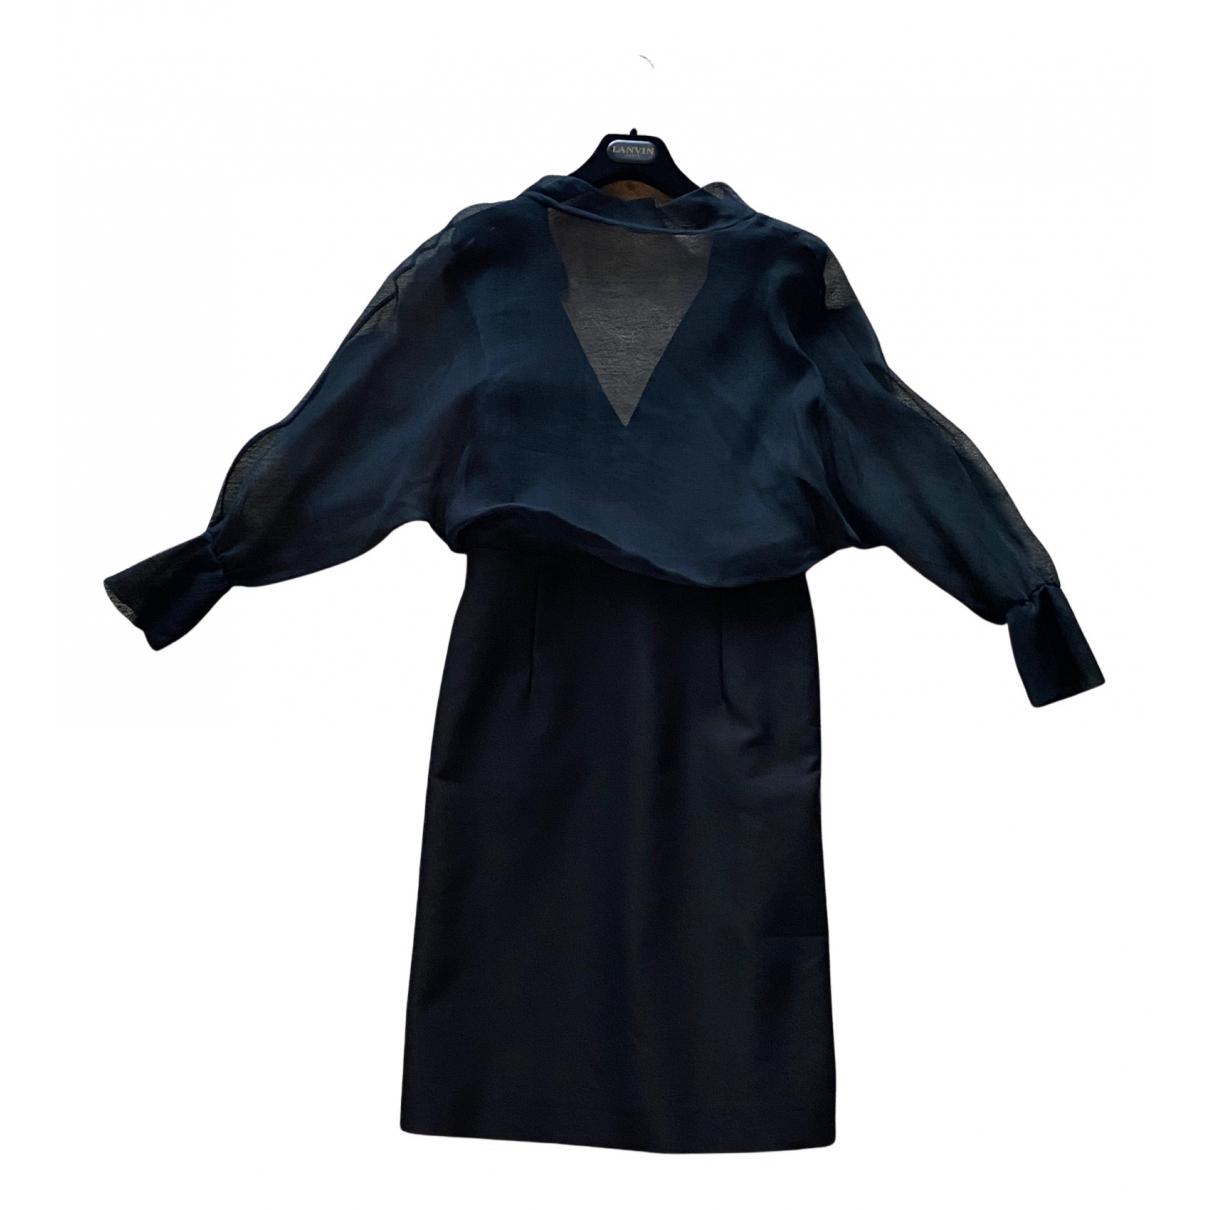 Marni \N Kleid in  Schwarz Baumwolle